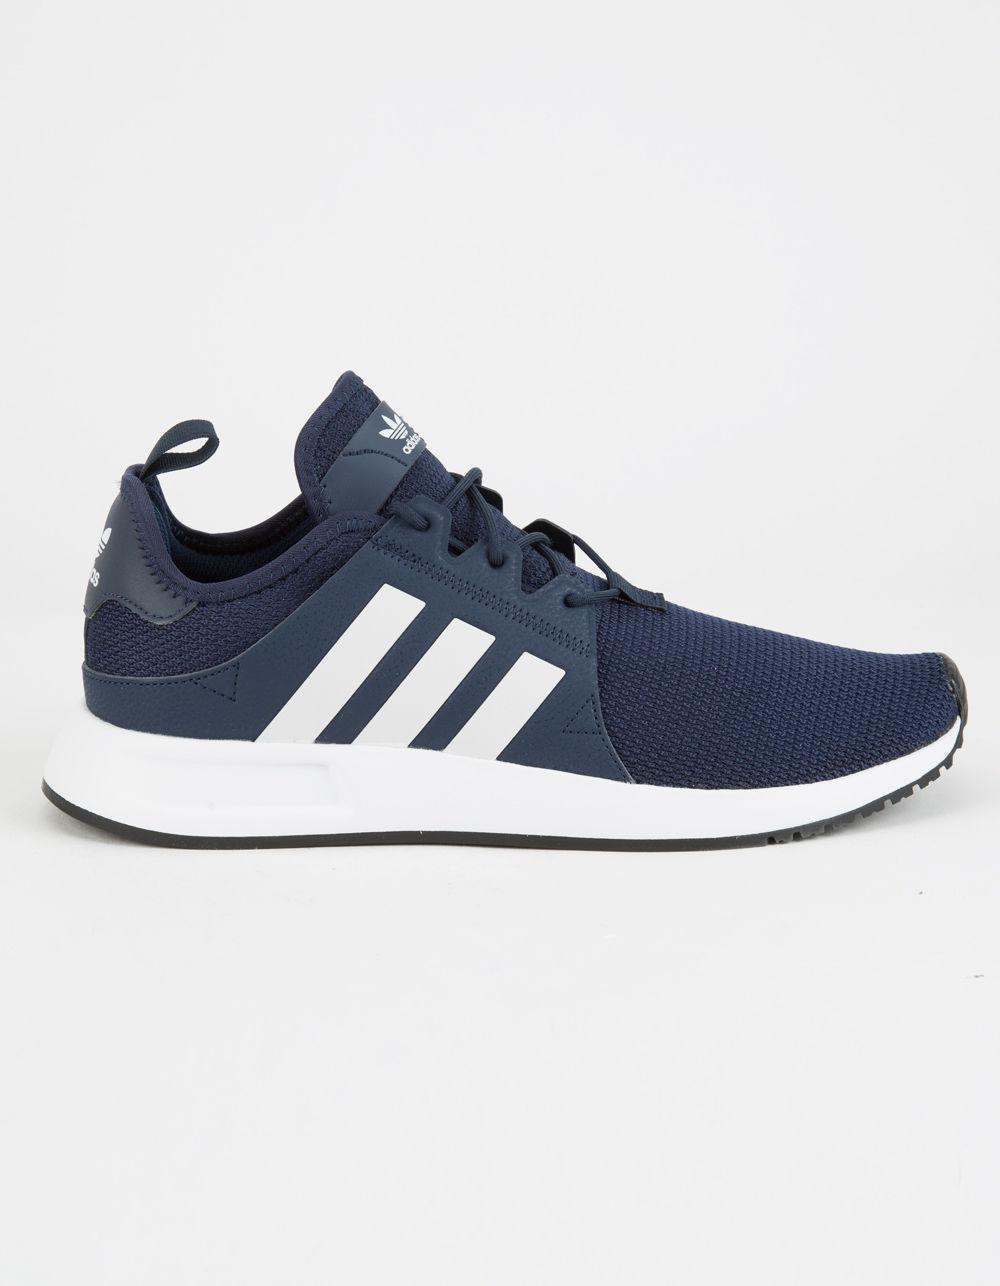 5b44e687981 Lyst - adidas X plr Navy   White Shoes in Blue for Men